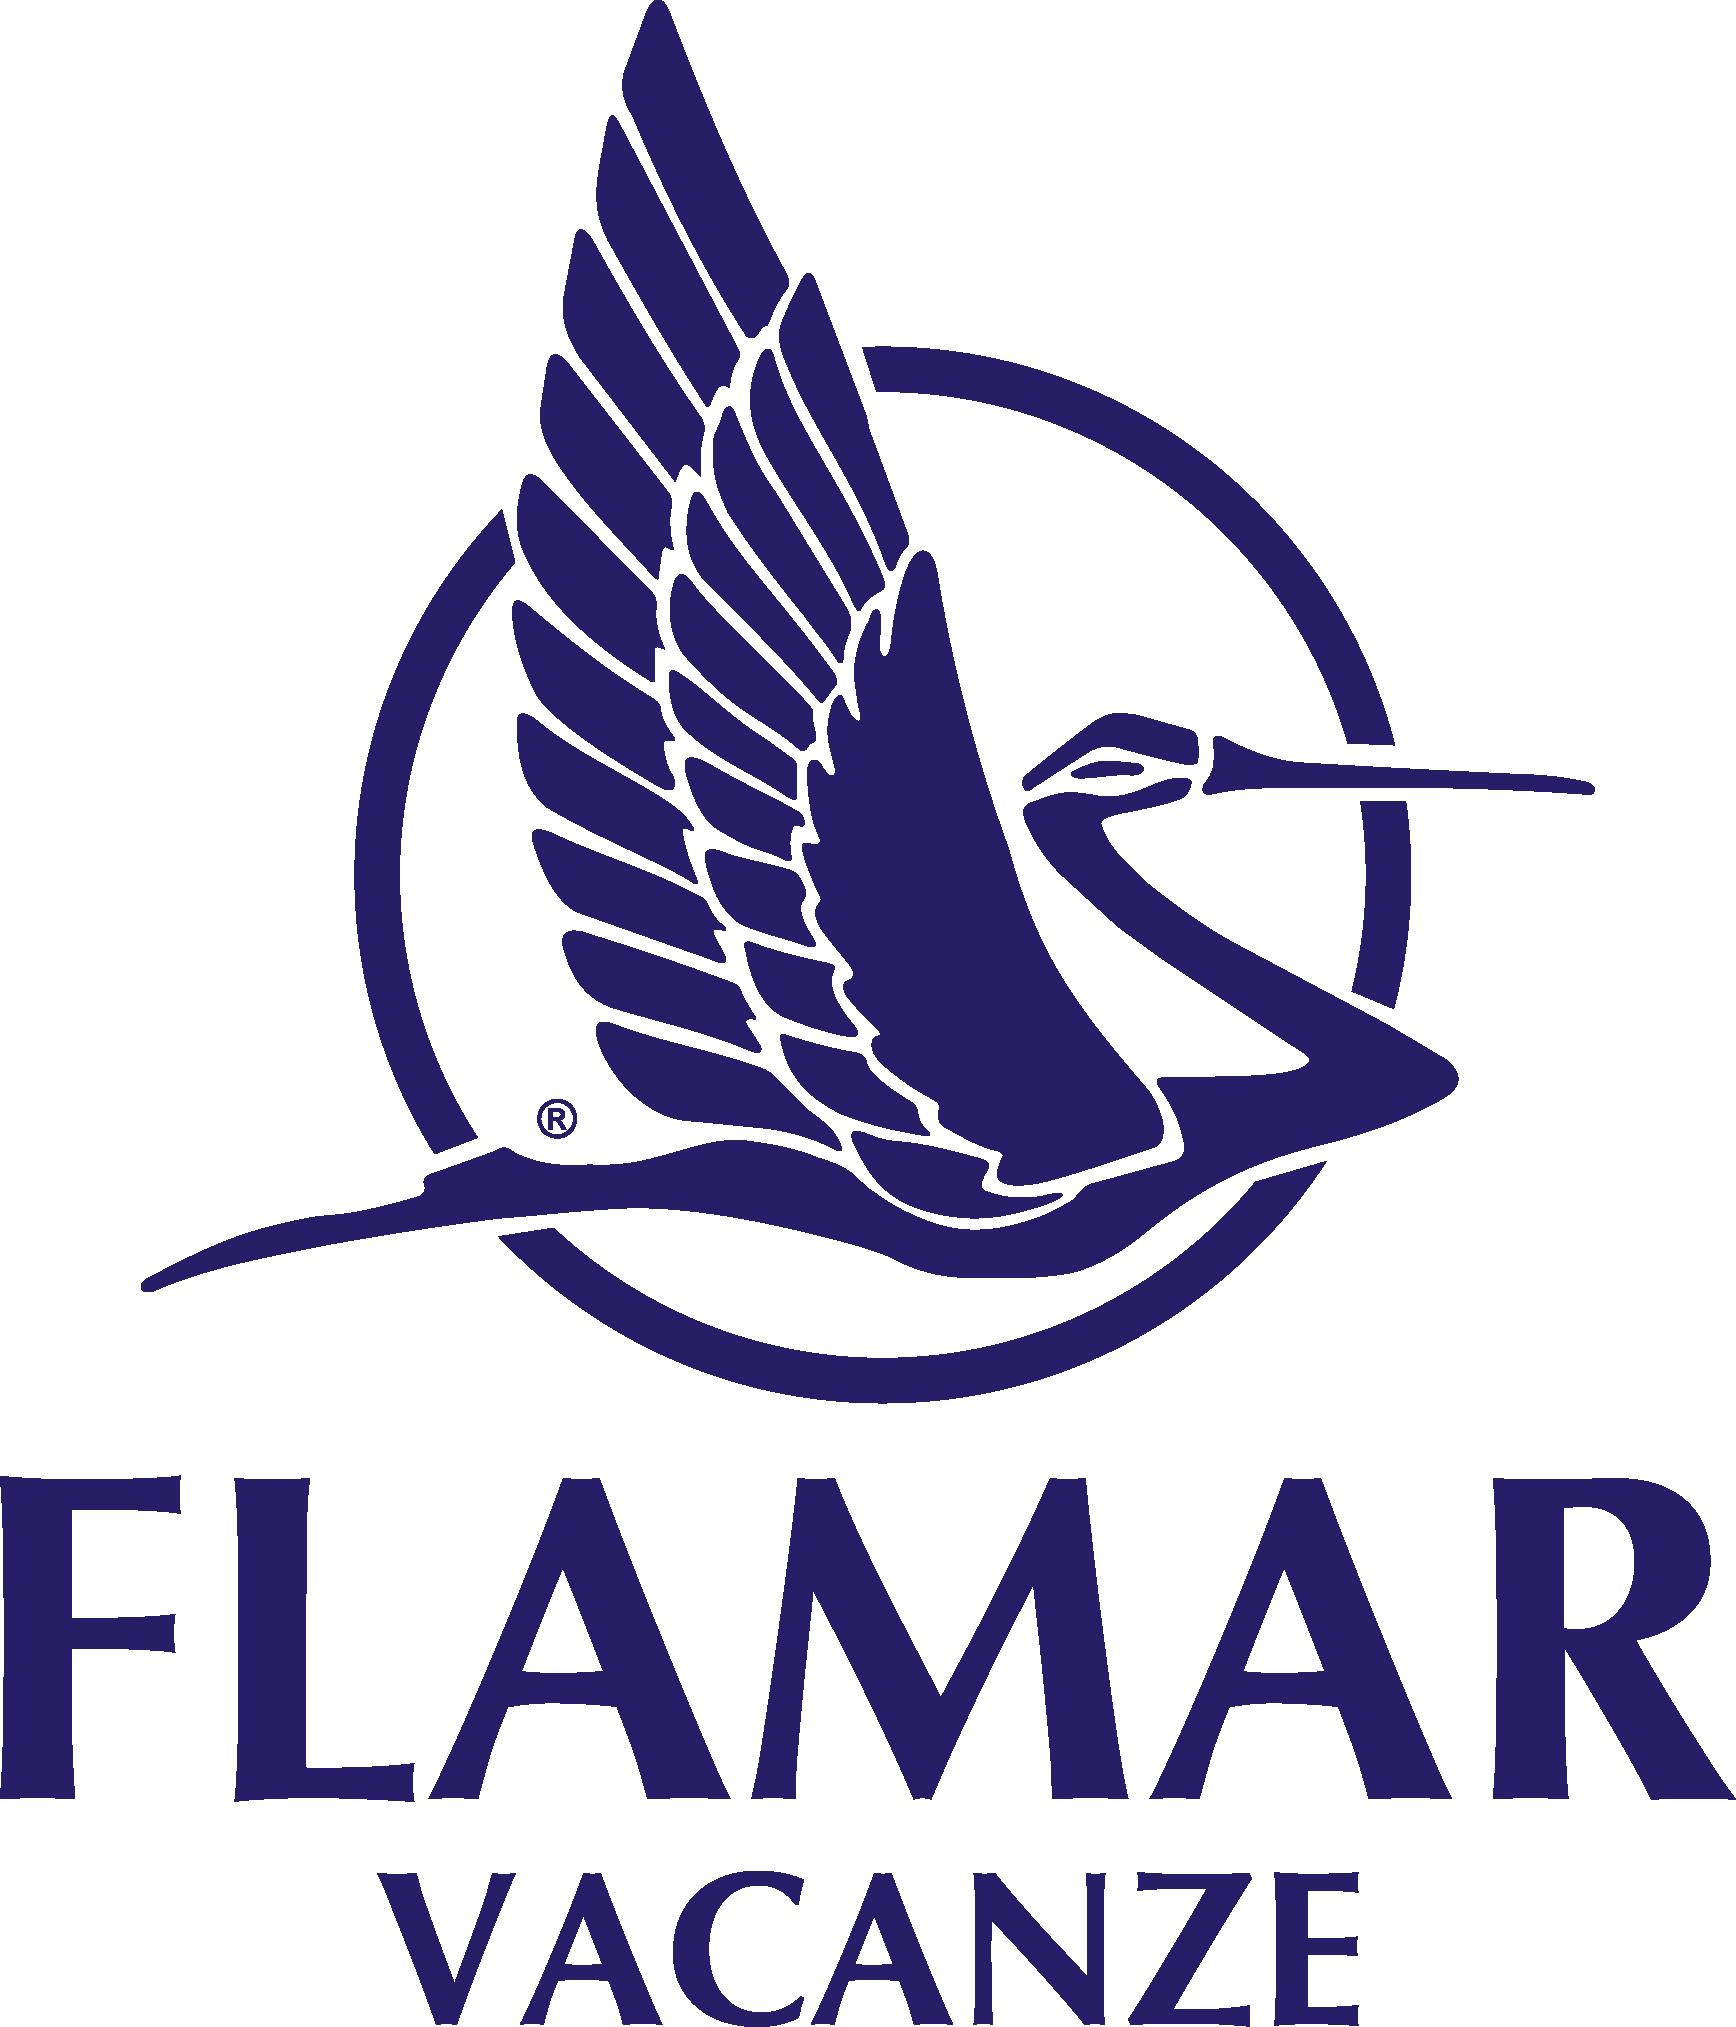 Flamar Vacanze